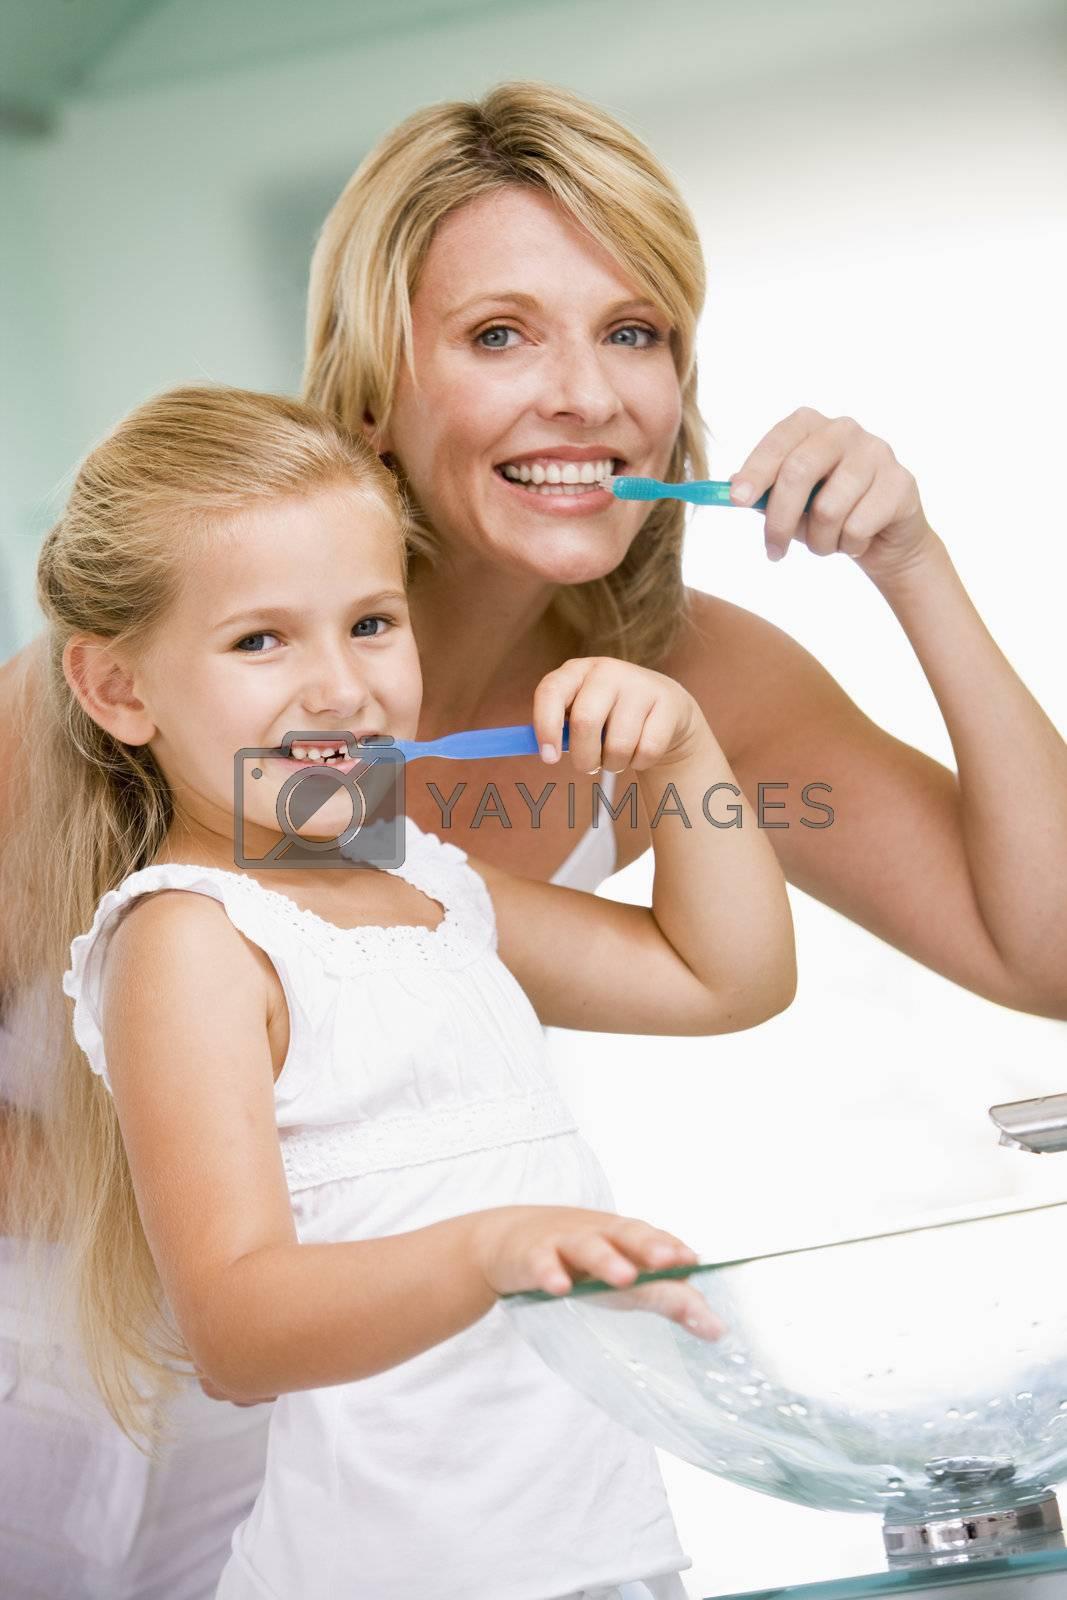 Woman and young girl in bathroom brushing teeth